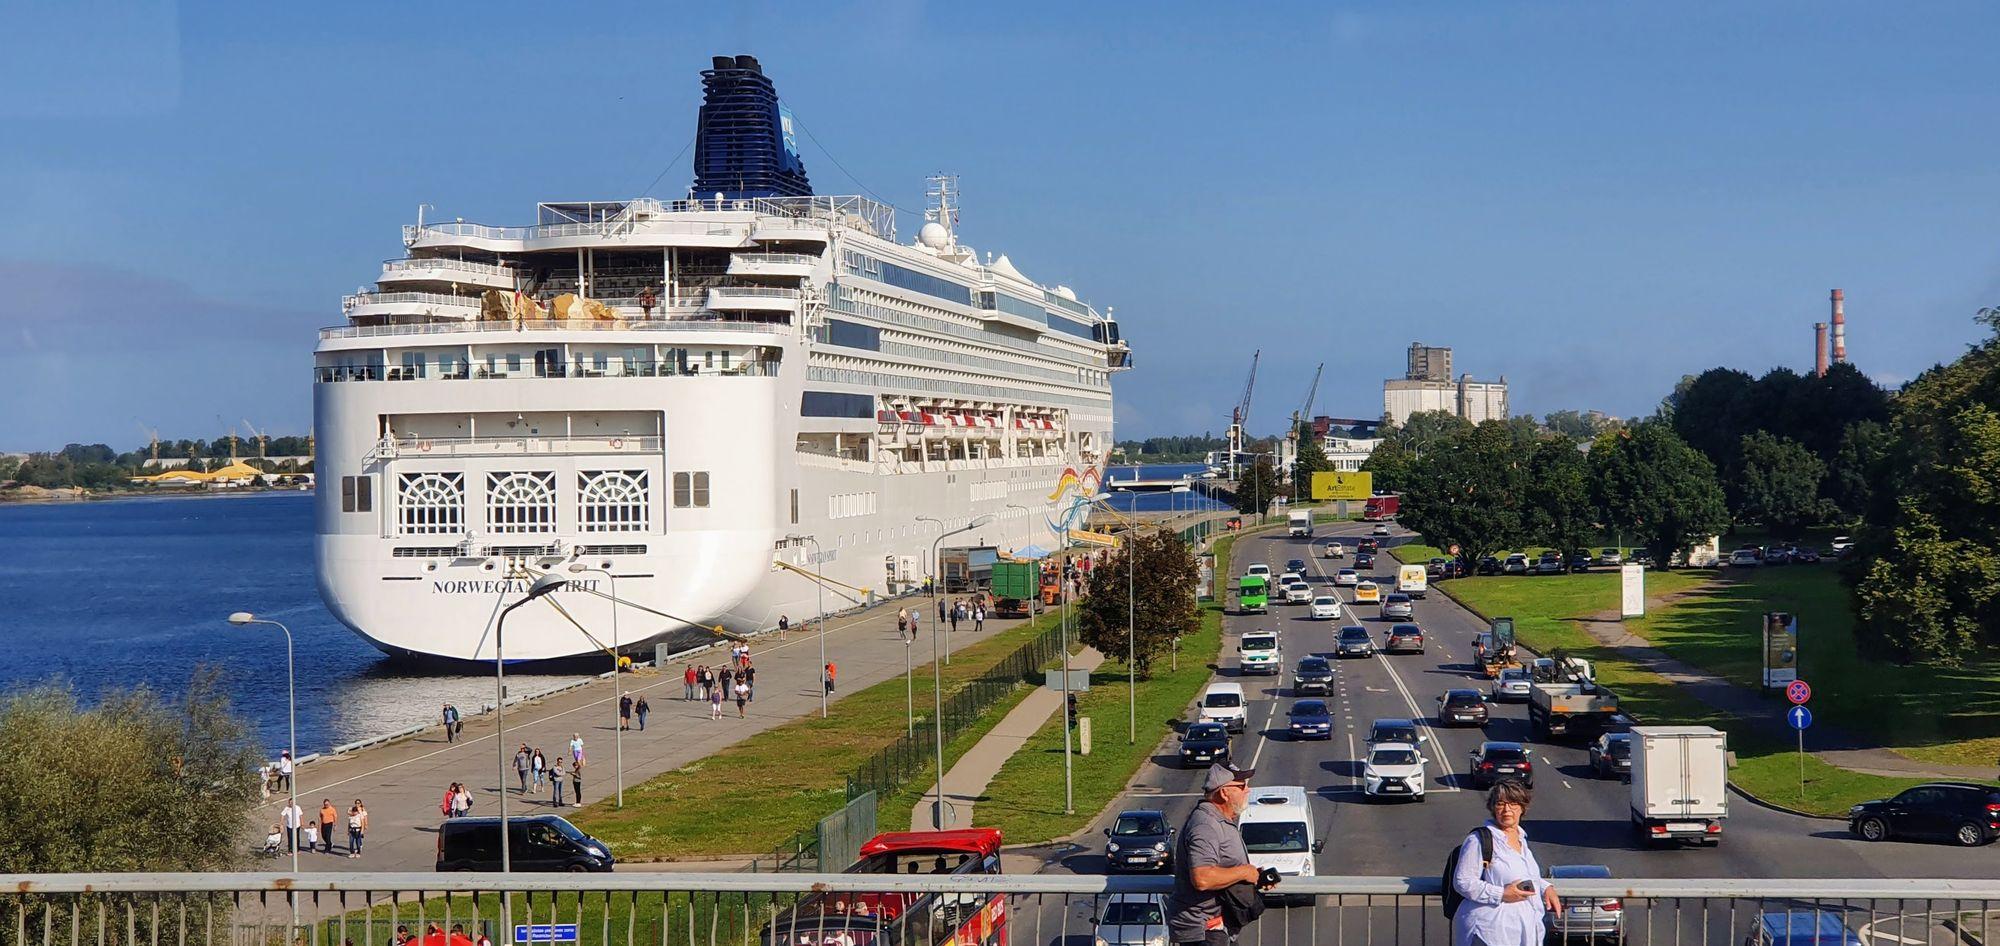 El imponente Norwegian Spirit en Riga, Capital de Letonia